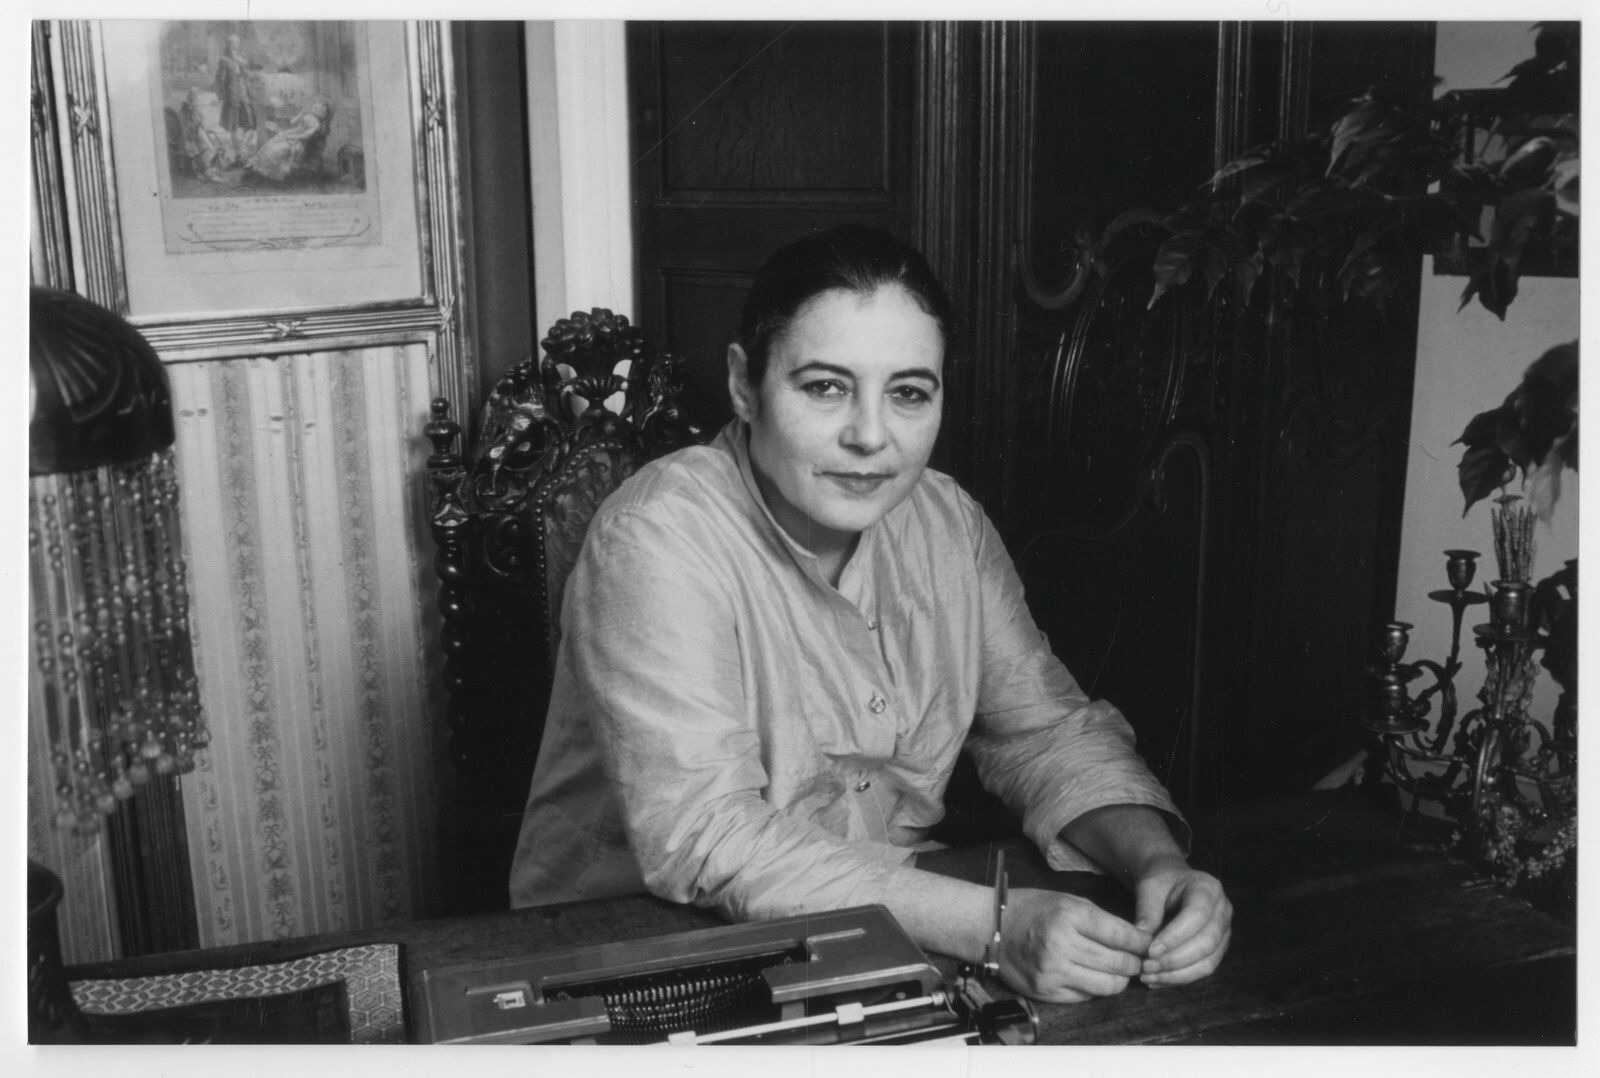 image for Albiach, Anne-Marie (1937-2012)